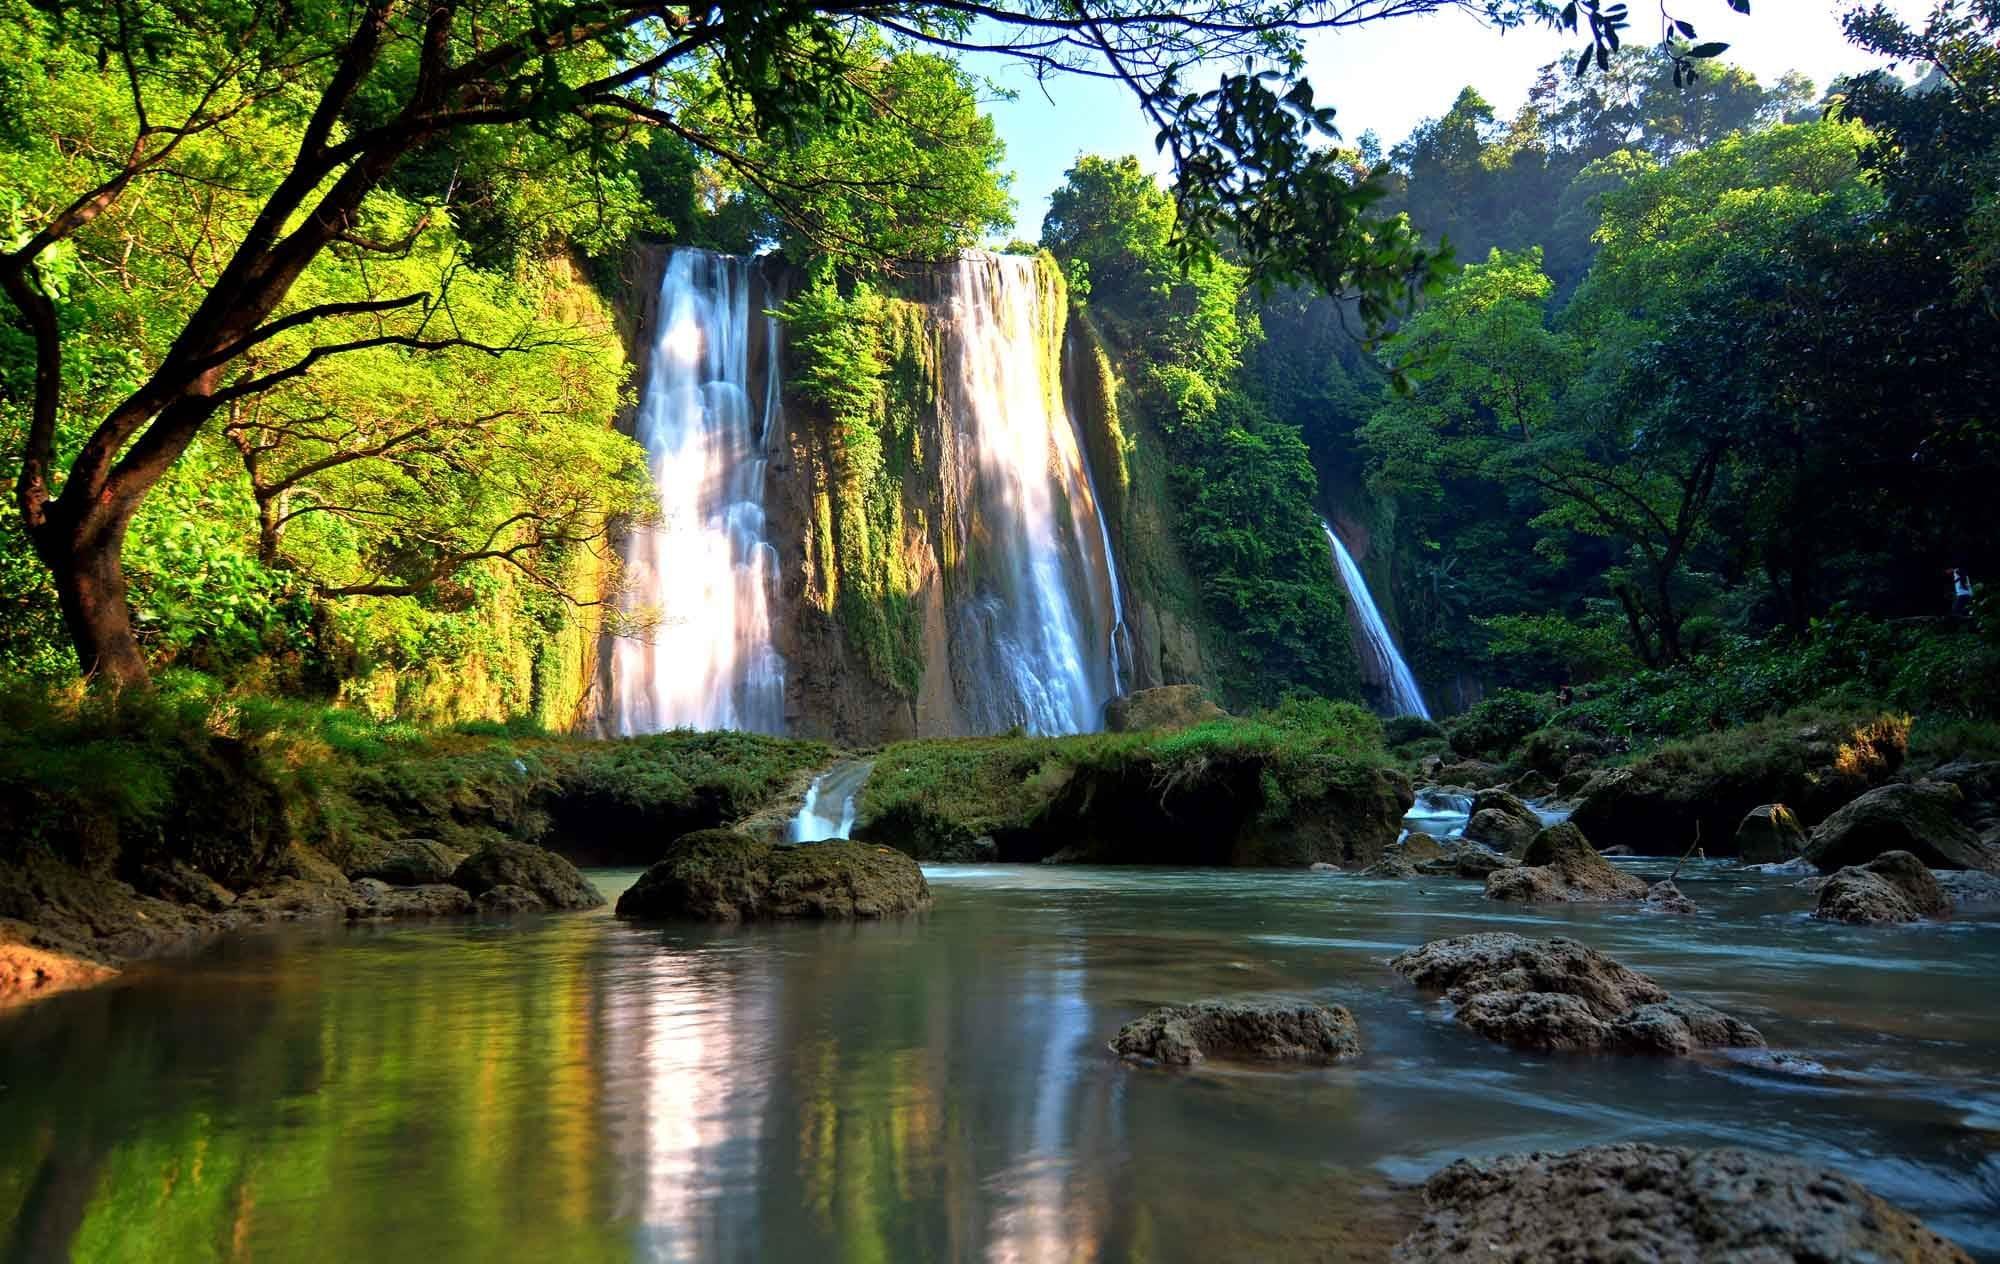 9 Tempat Wisata di Jawa Barat yang Wajib Dikunjungi